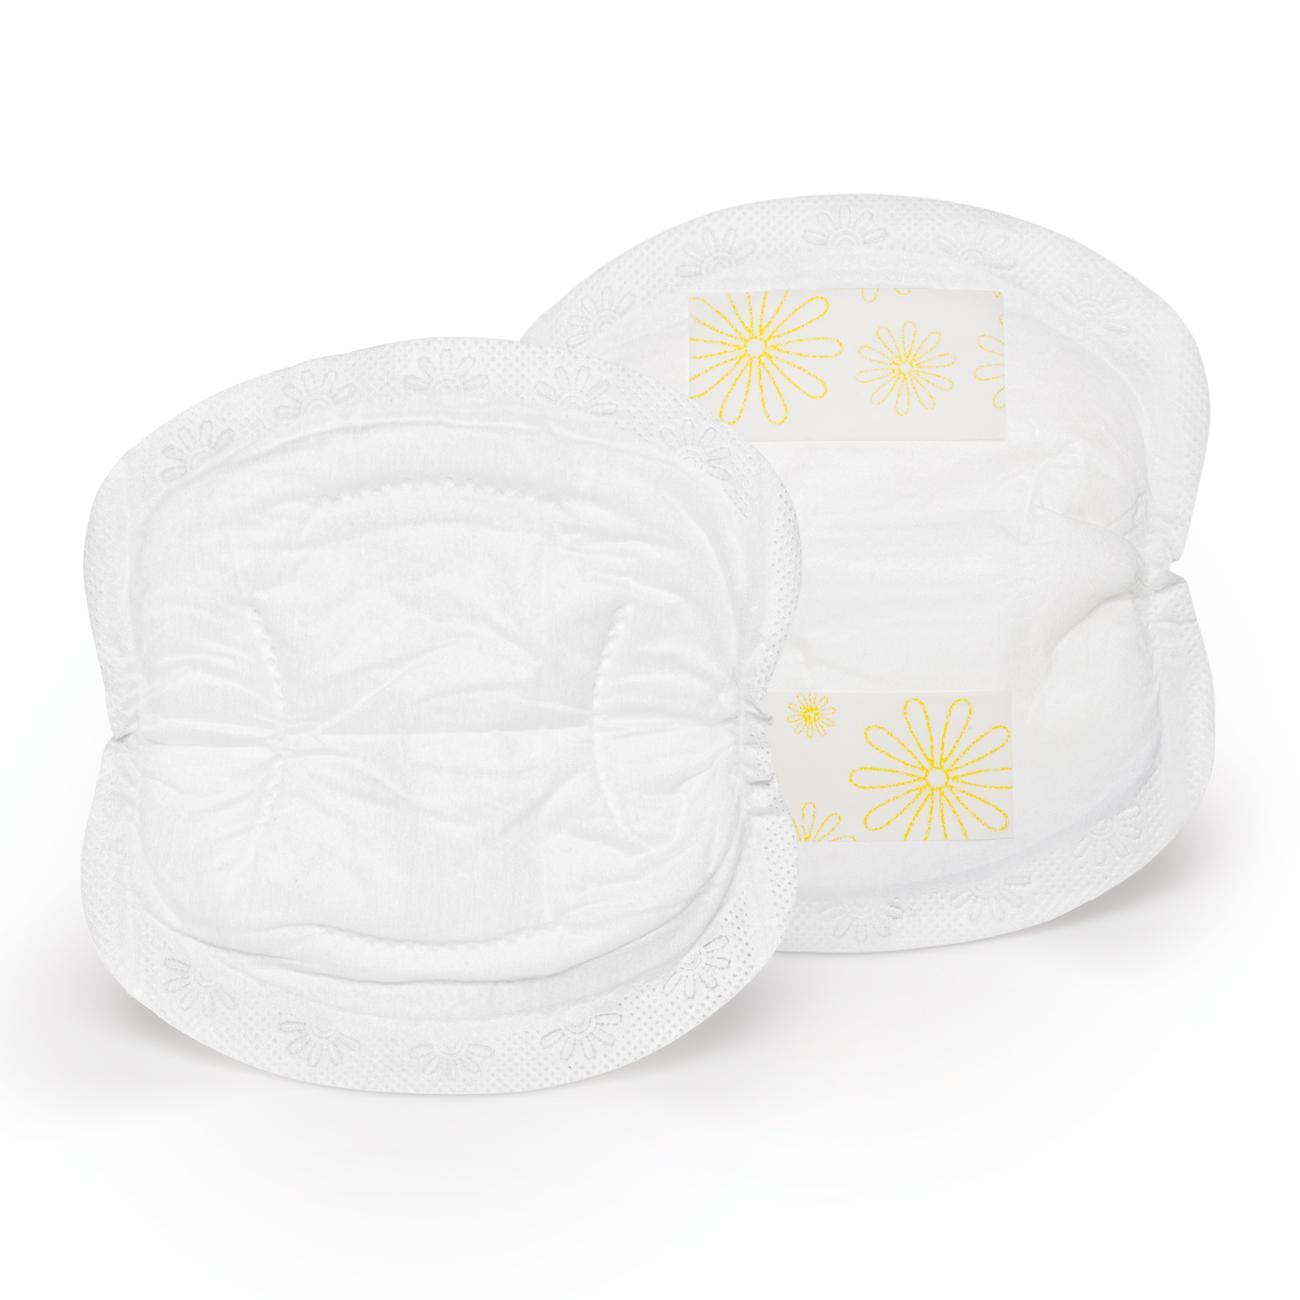 Amazon.com : Medela Disposable Nursing Bra Pads, 30 Count ...